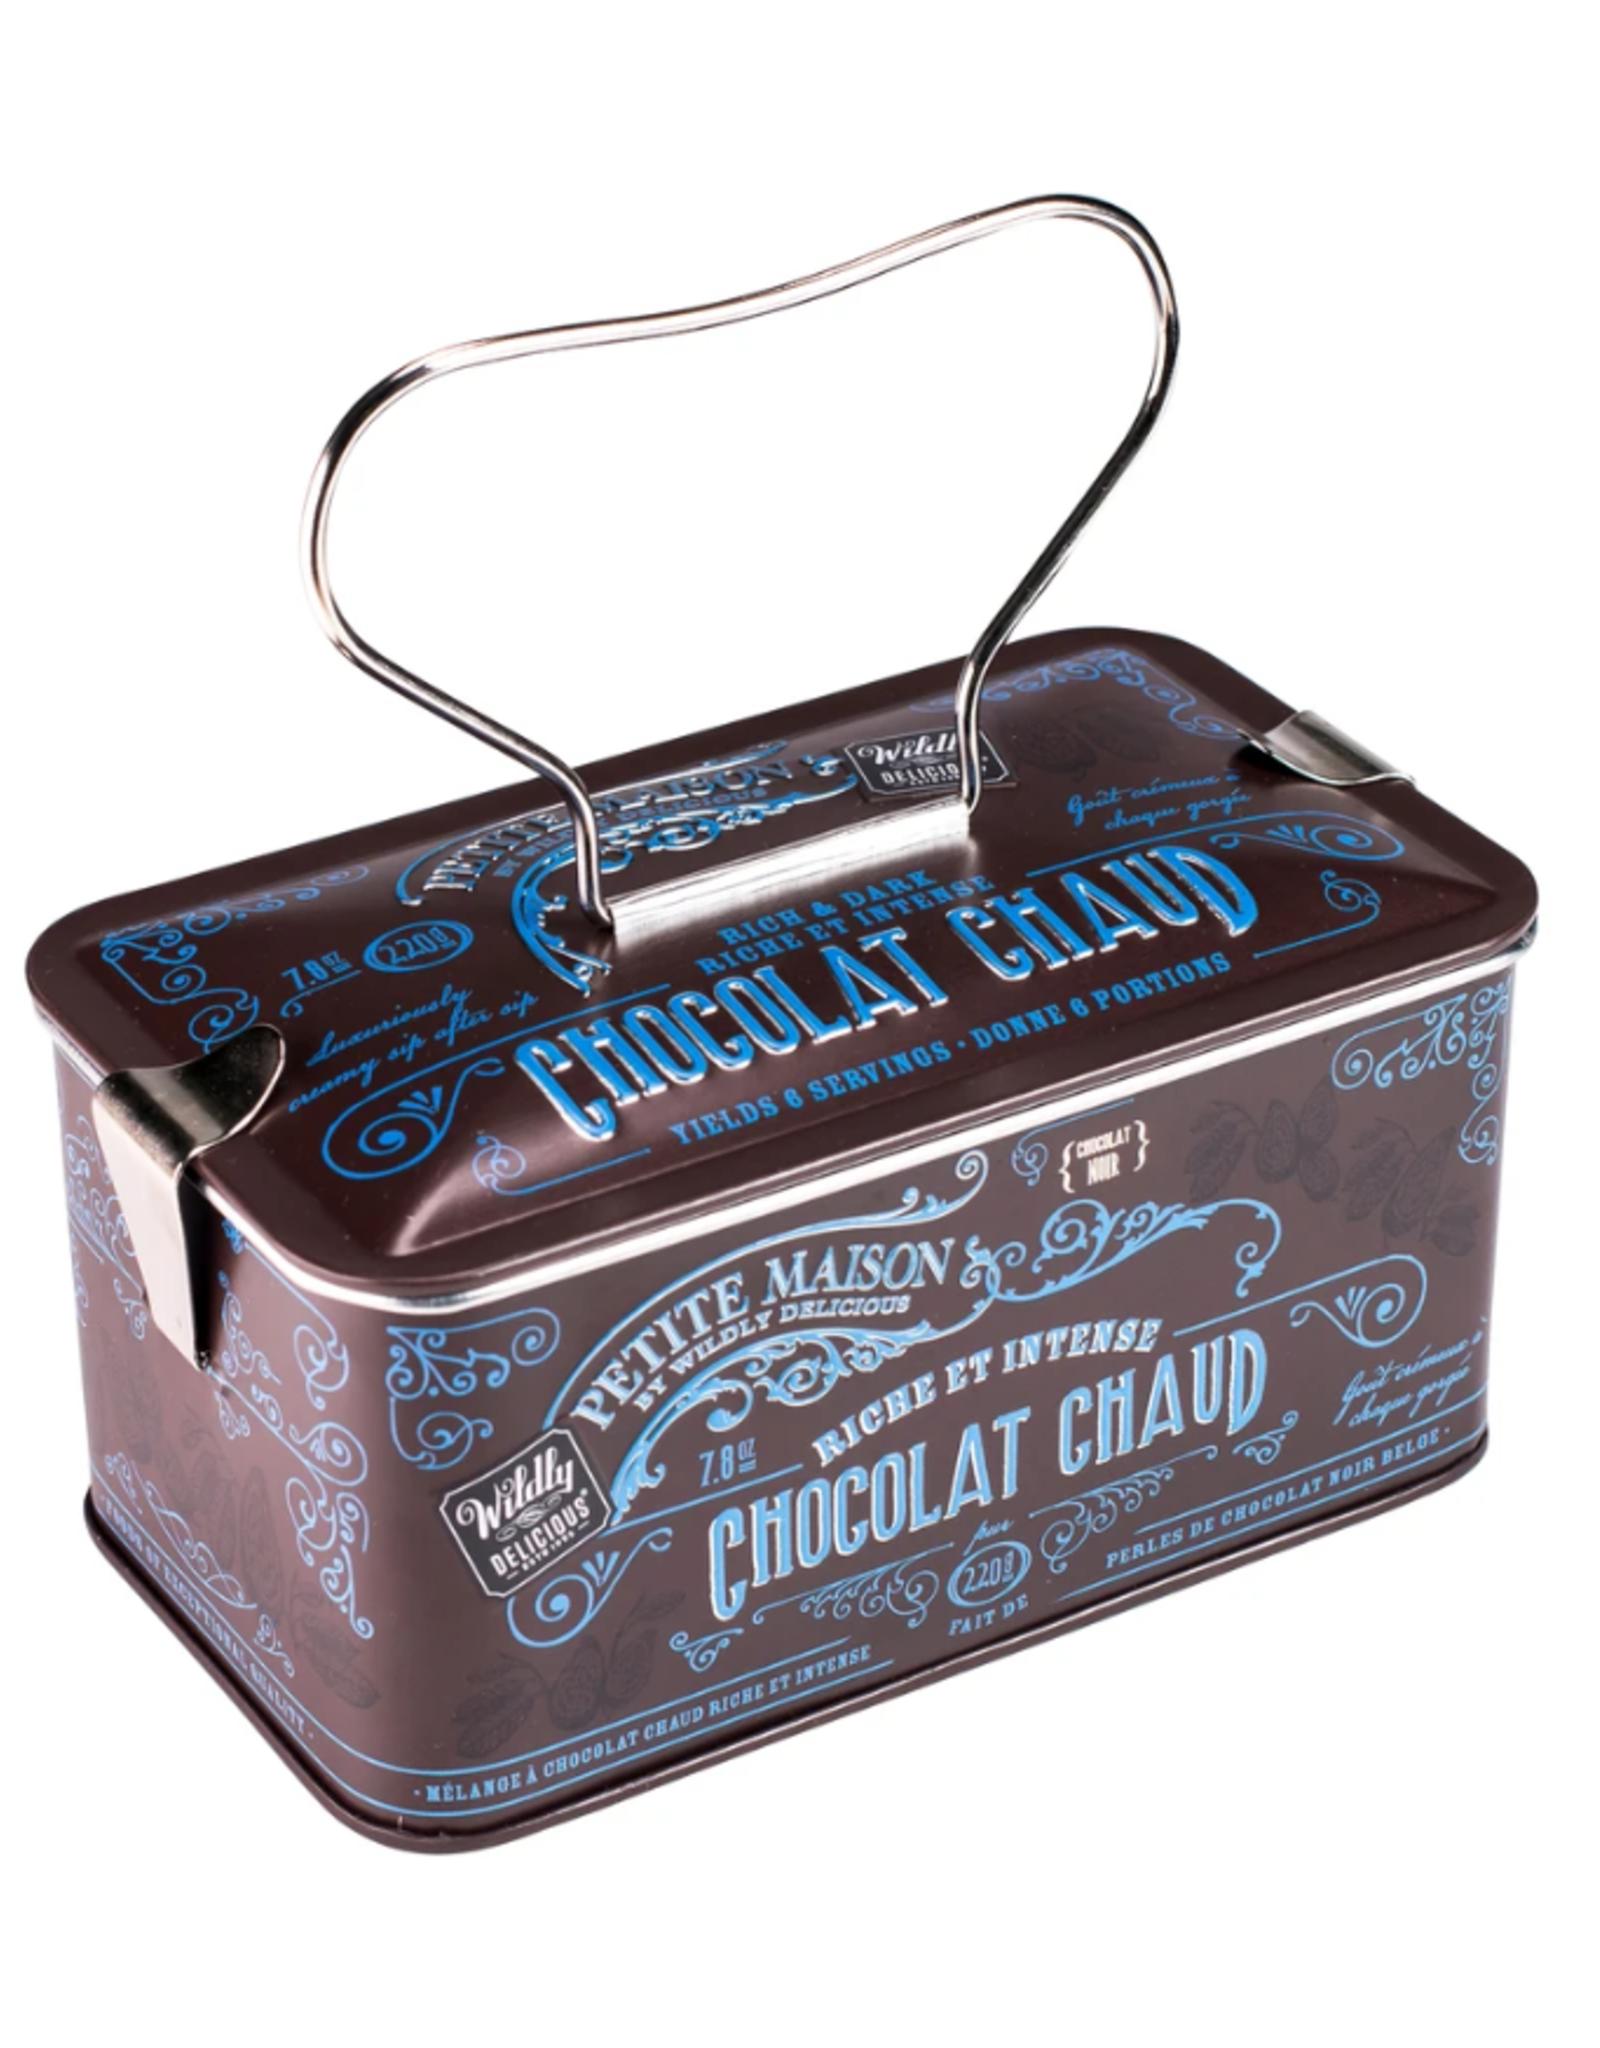 Wildly Delicious Rich And Dark Chocolat Chaud